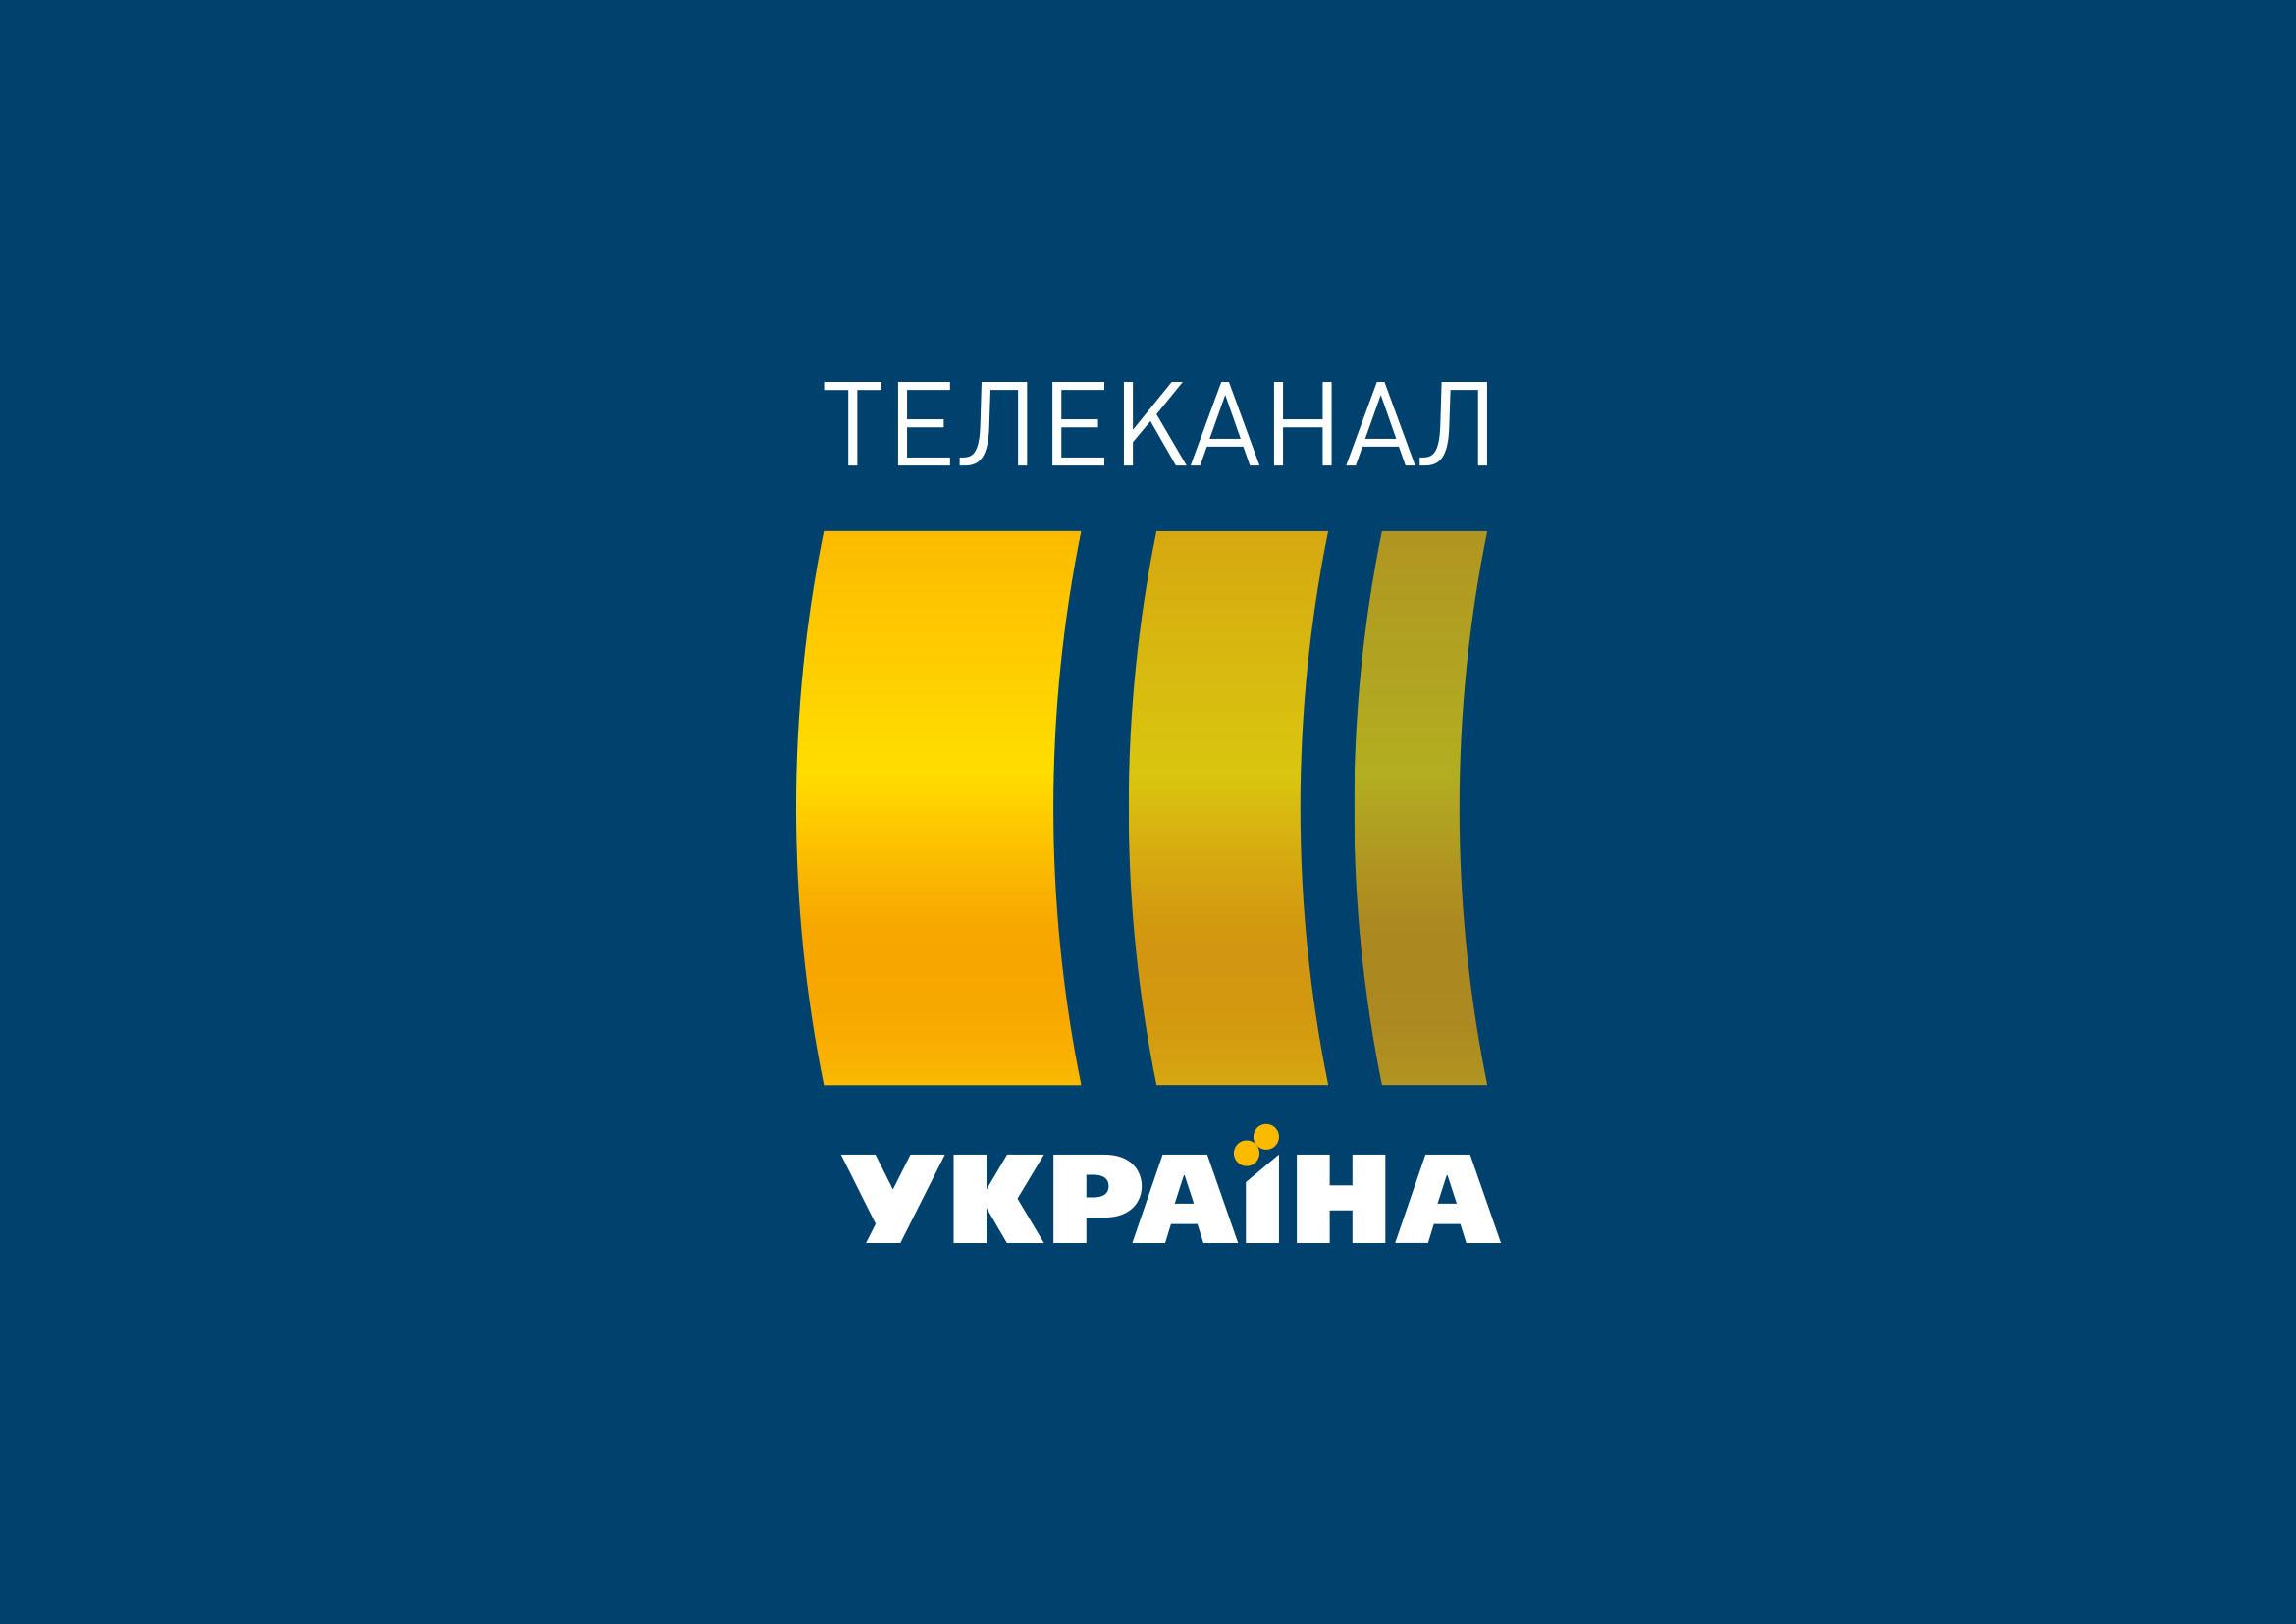 Канал «Україна» оголосив дати прем'єр нового сезону - Детектор медіа.